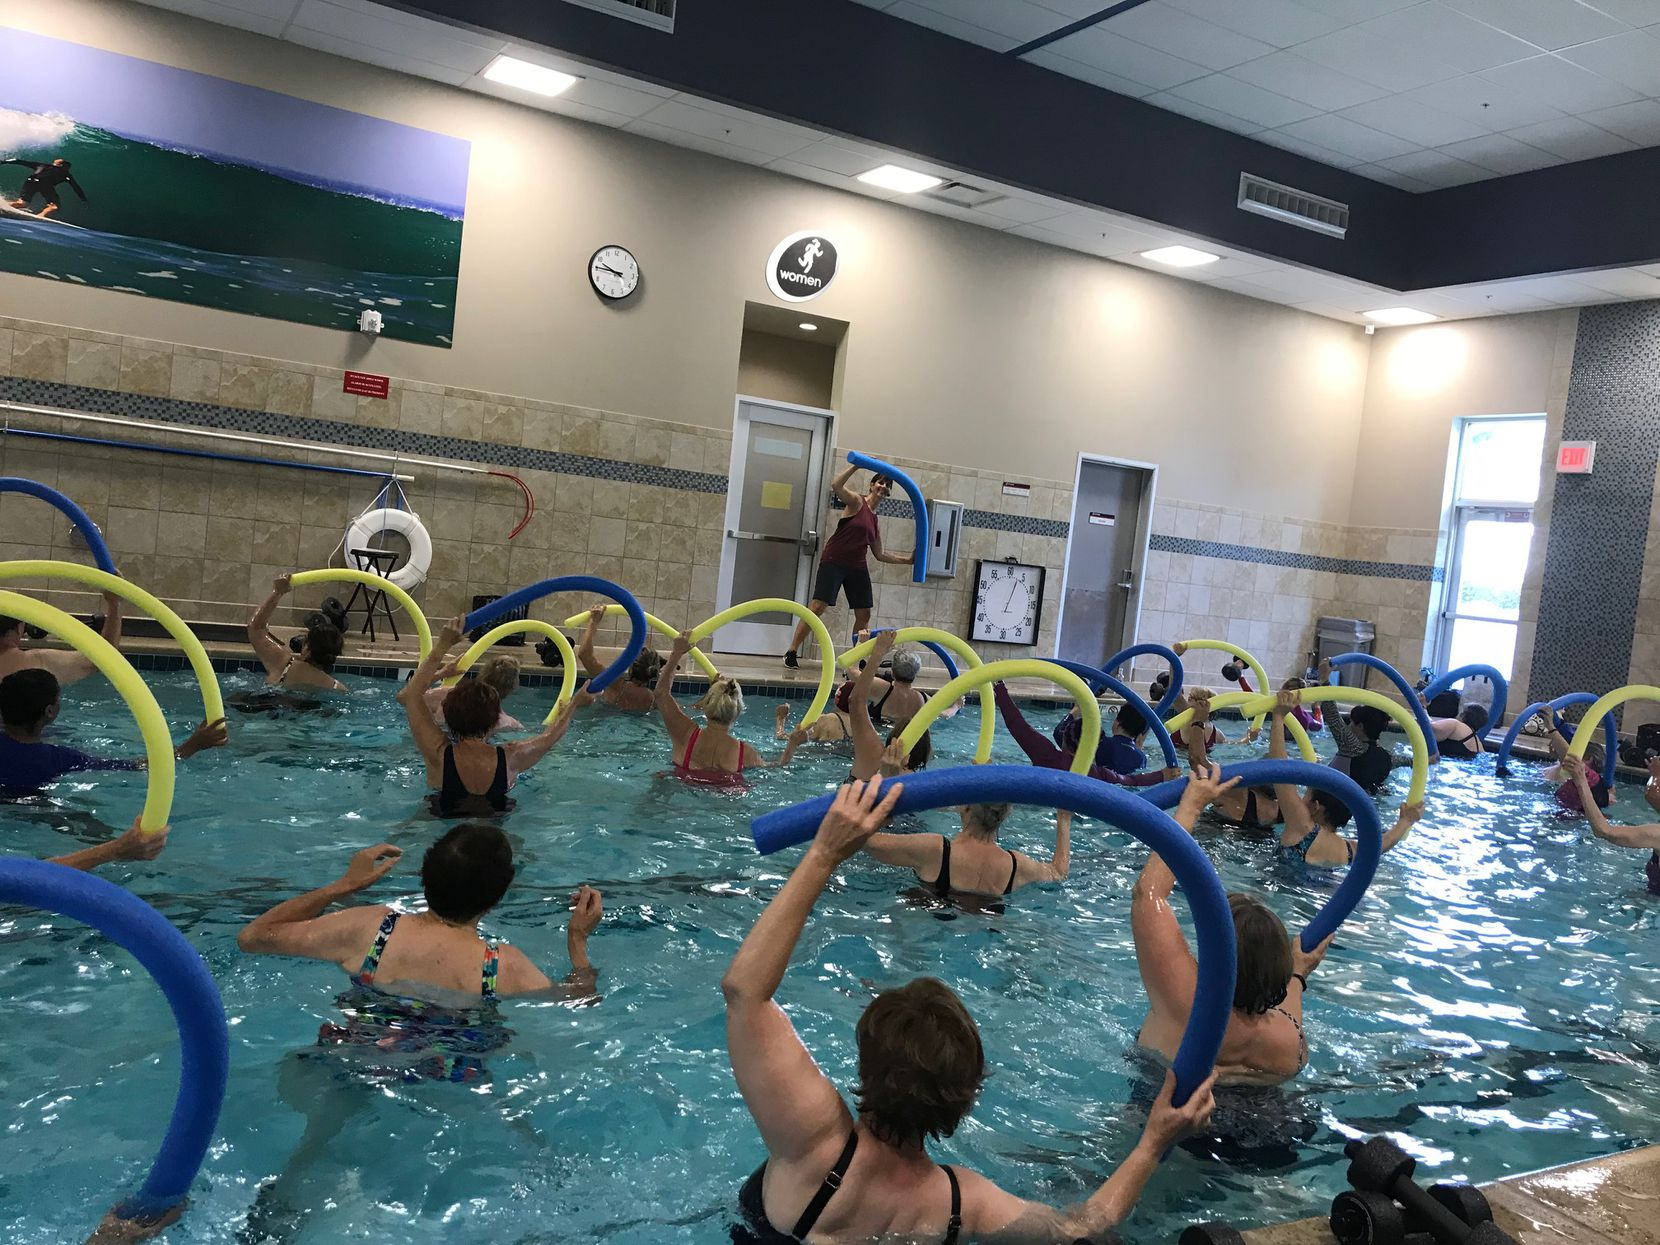 Seniors took part in a pre-pandemic aqua aerobics class at 24 Hour Fitness.